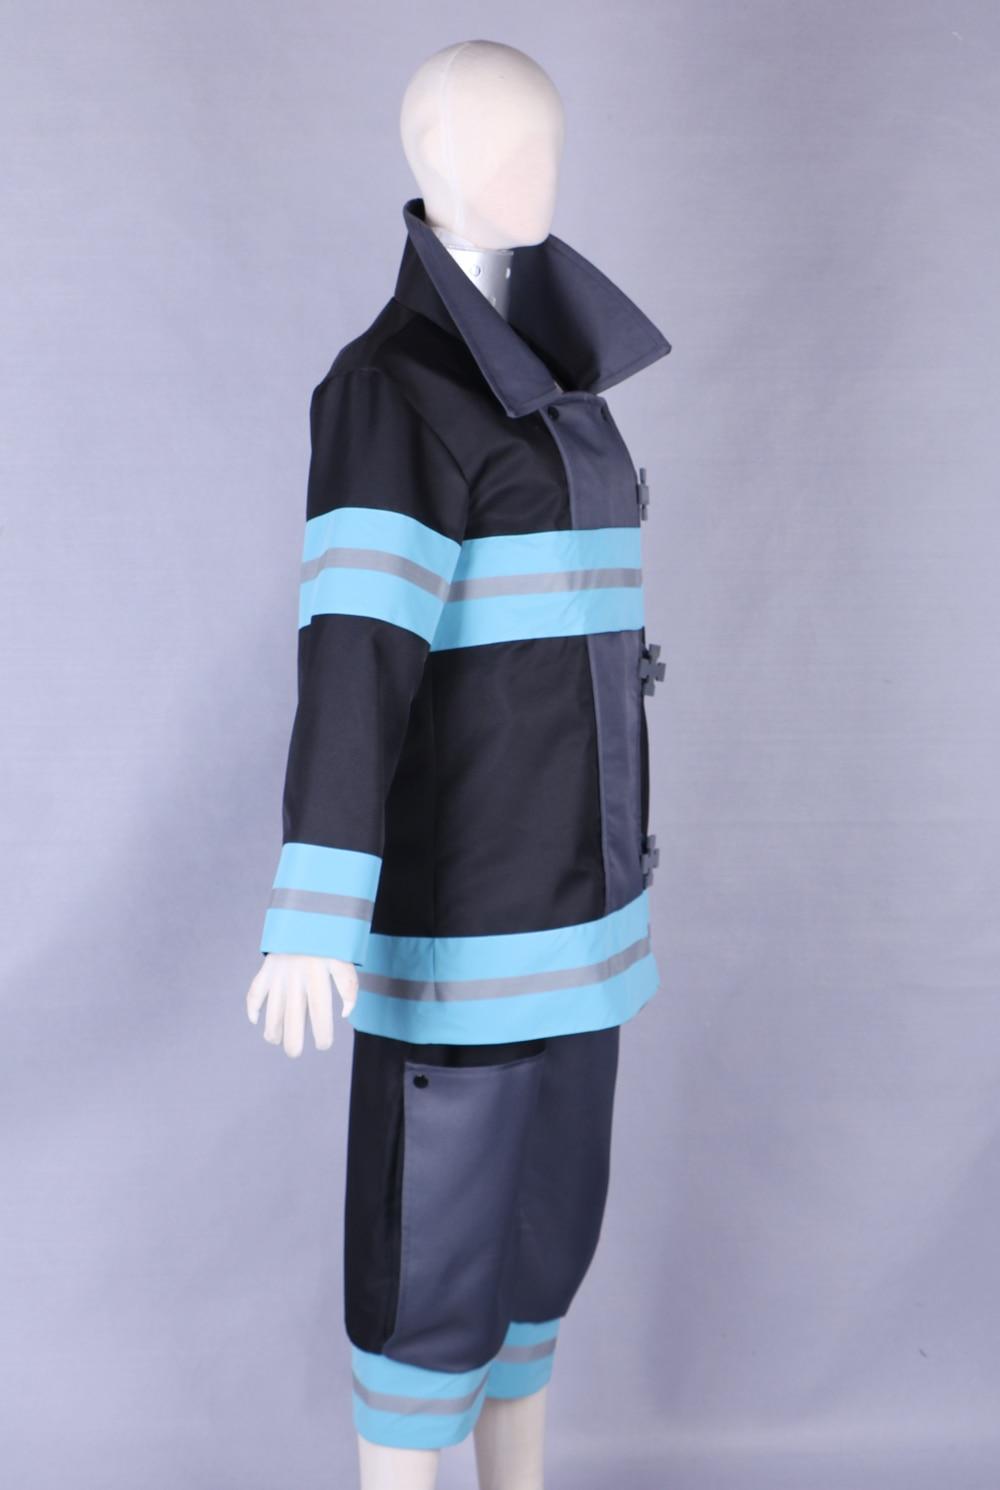 Force de feu Enen No Shouboutai Kotatsu Tamaki combat Costume équipe Cosplay Costume pompier uniforme tenues dhalloween